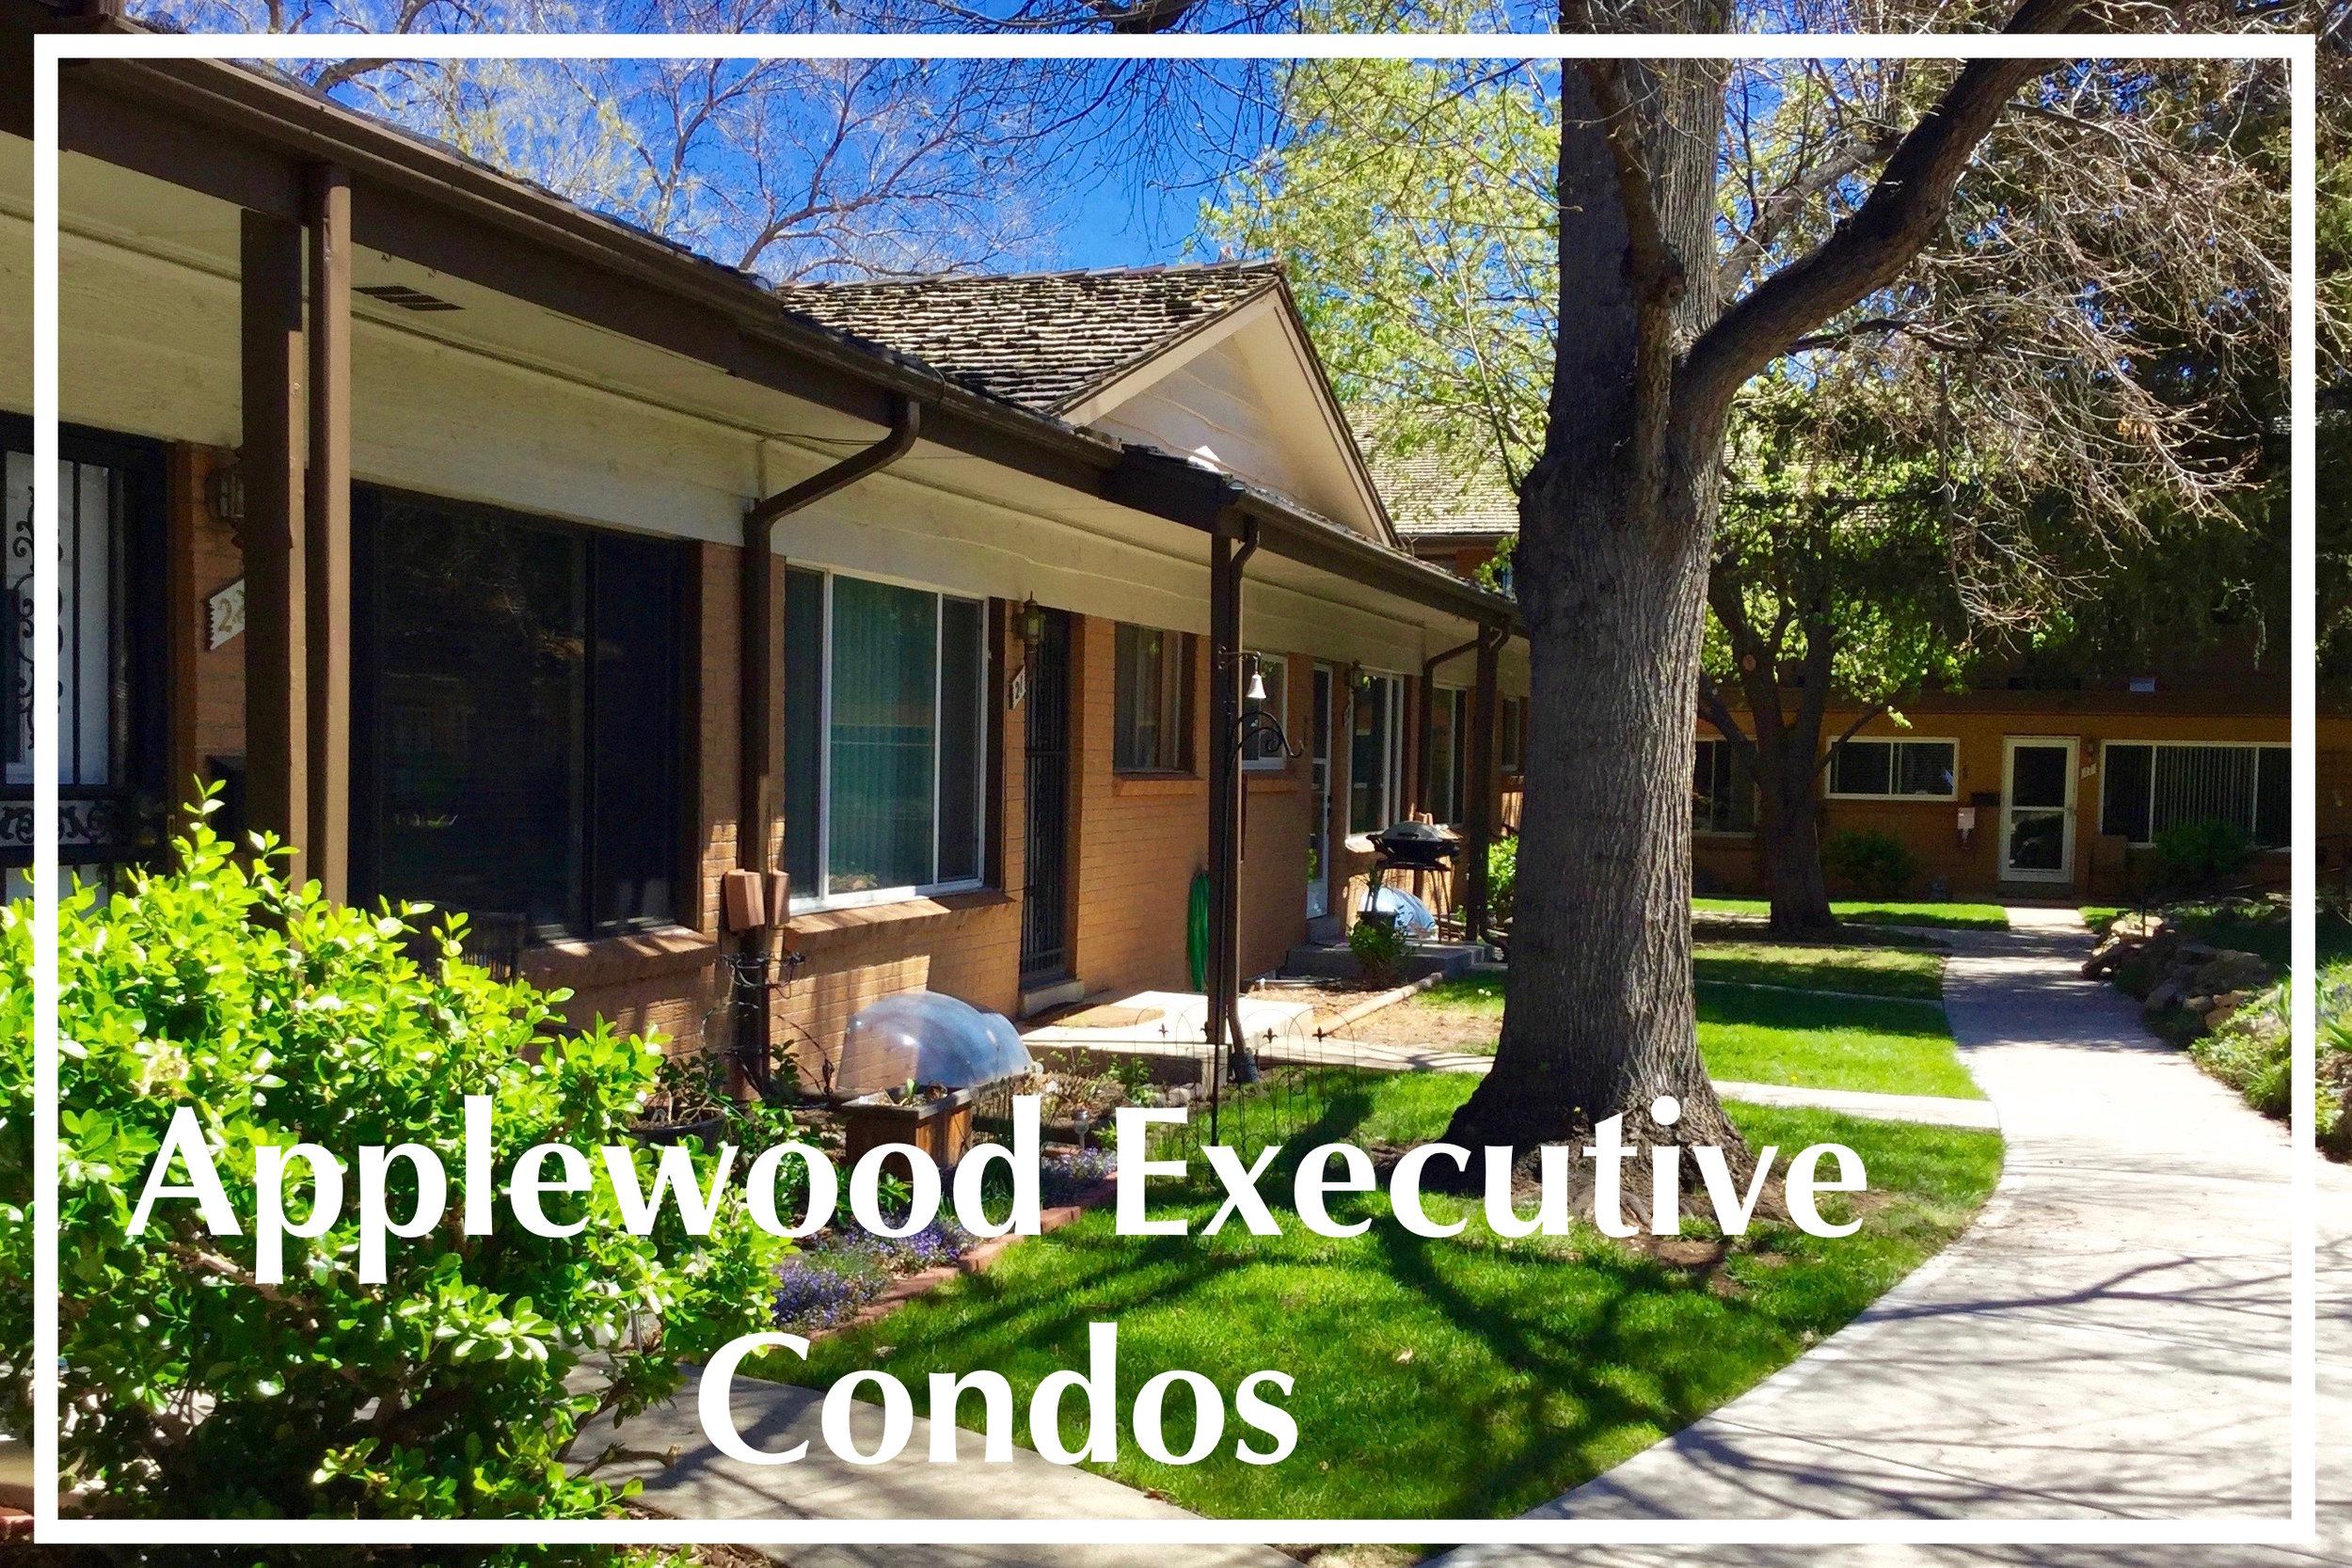 Applewood Executive Condos.jpg